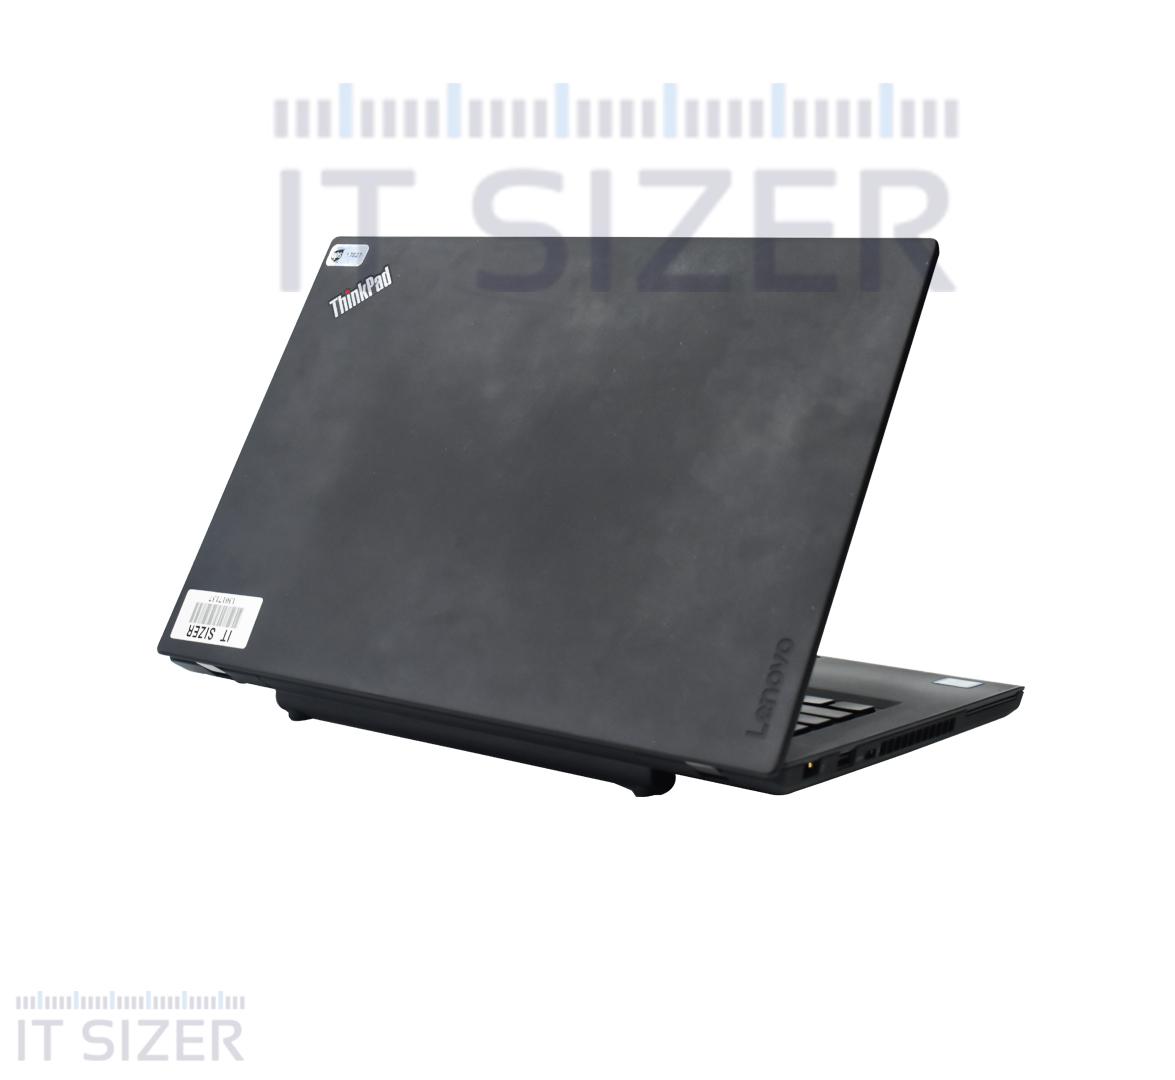 Lenovo T470 Business Laptop, Intel Core i5 CPU, 8GB DDR4 SODIMM RAM, 128GB SSD M2, 14 Touch Display, Windows 10 pro (Renewed)